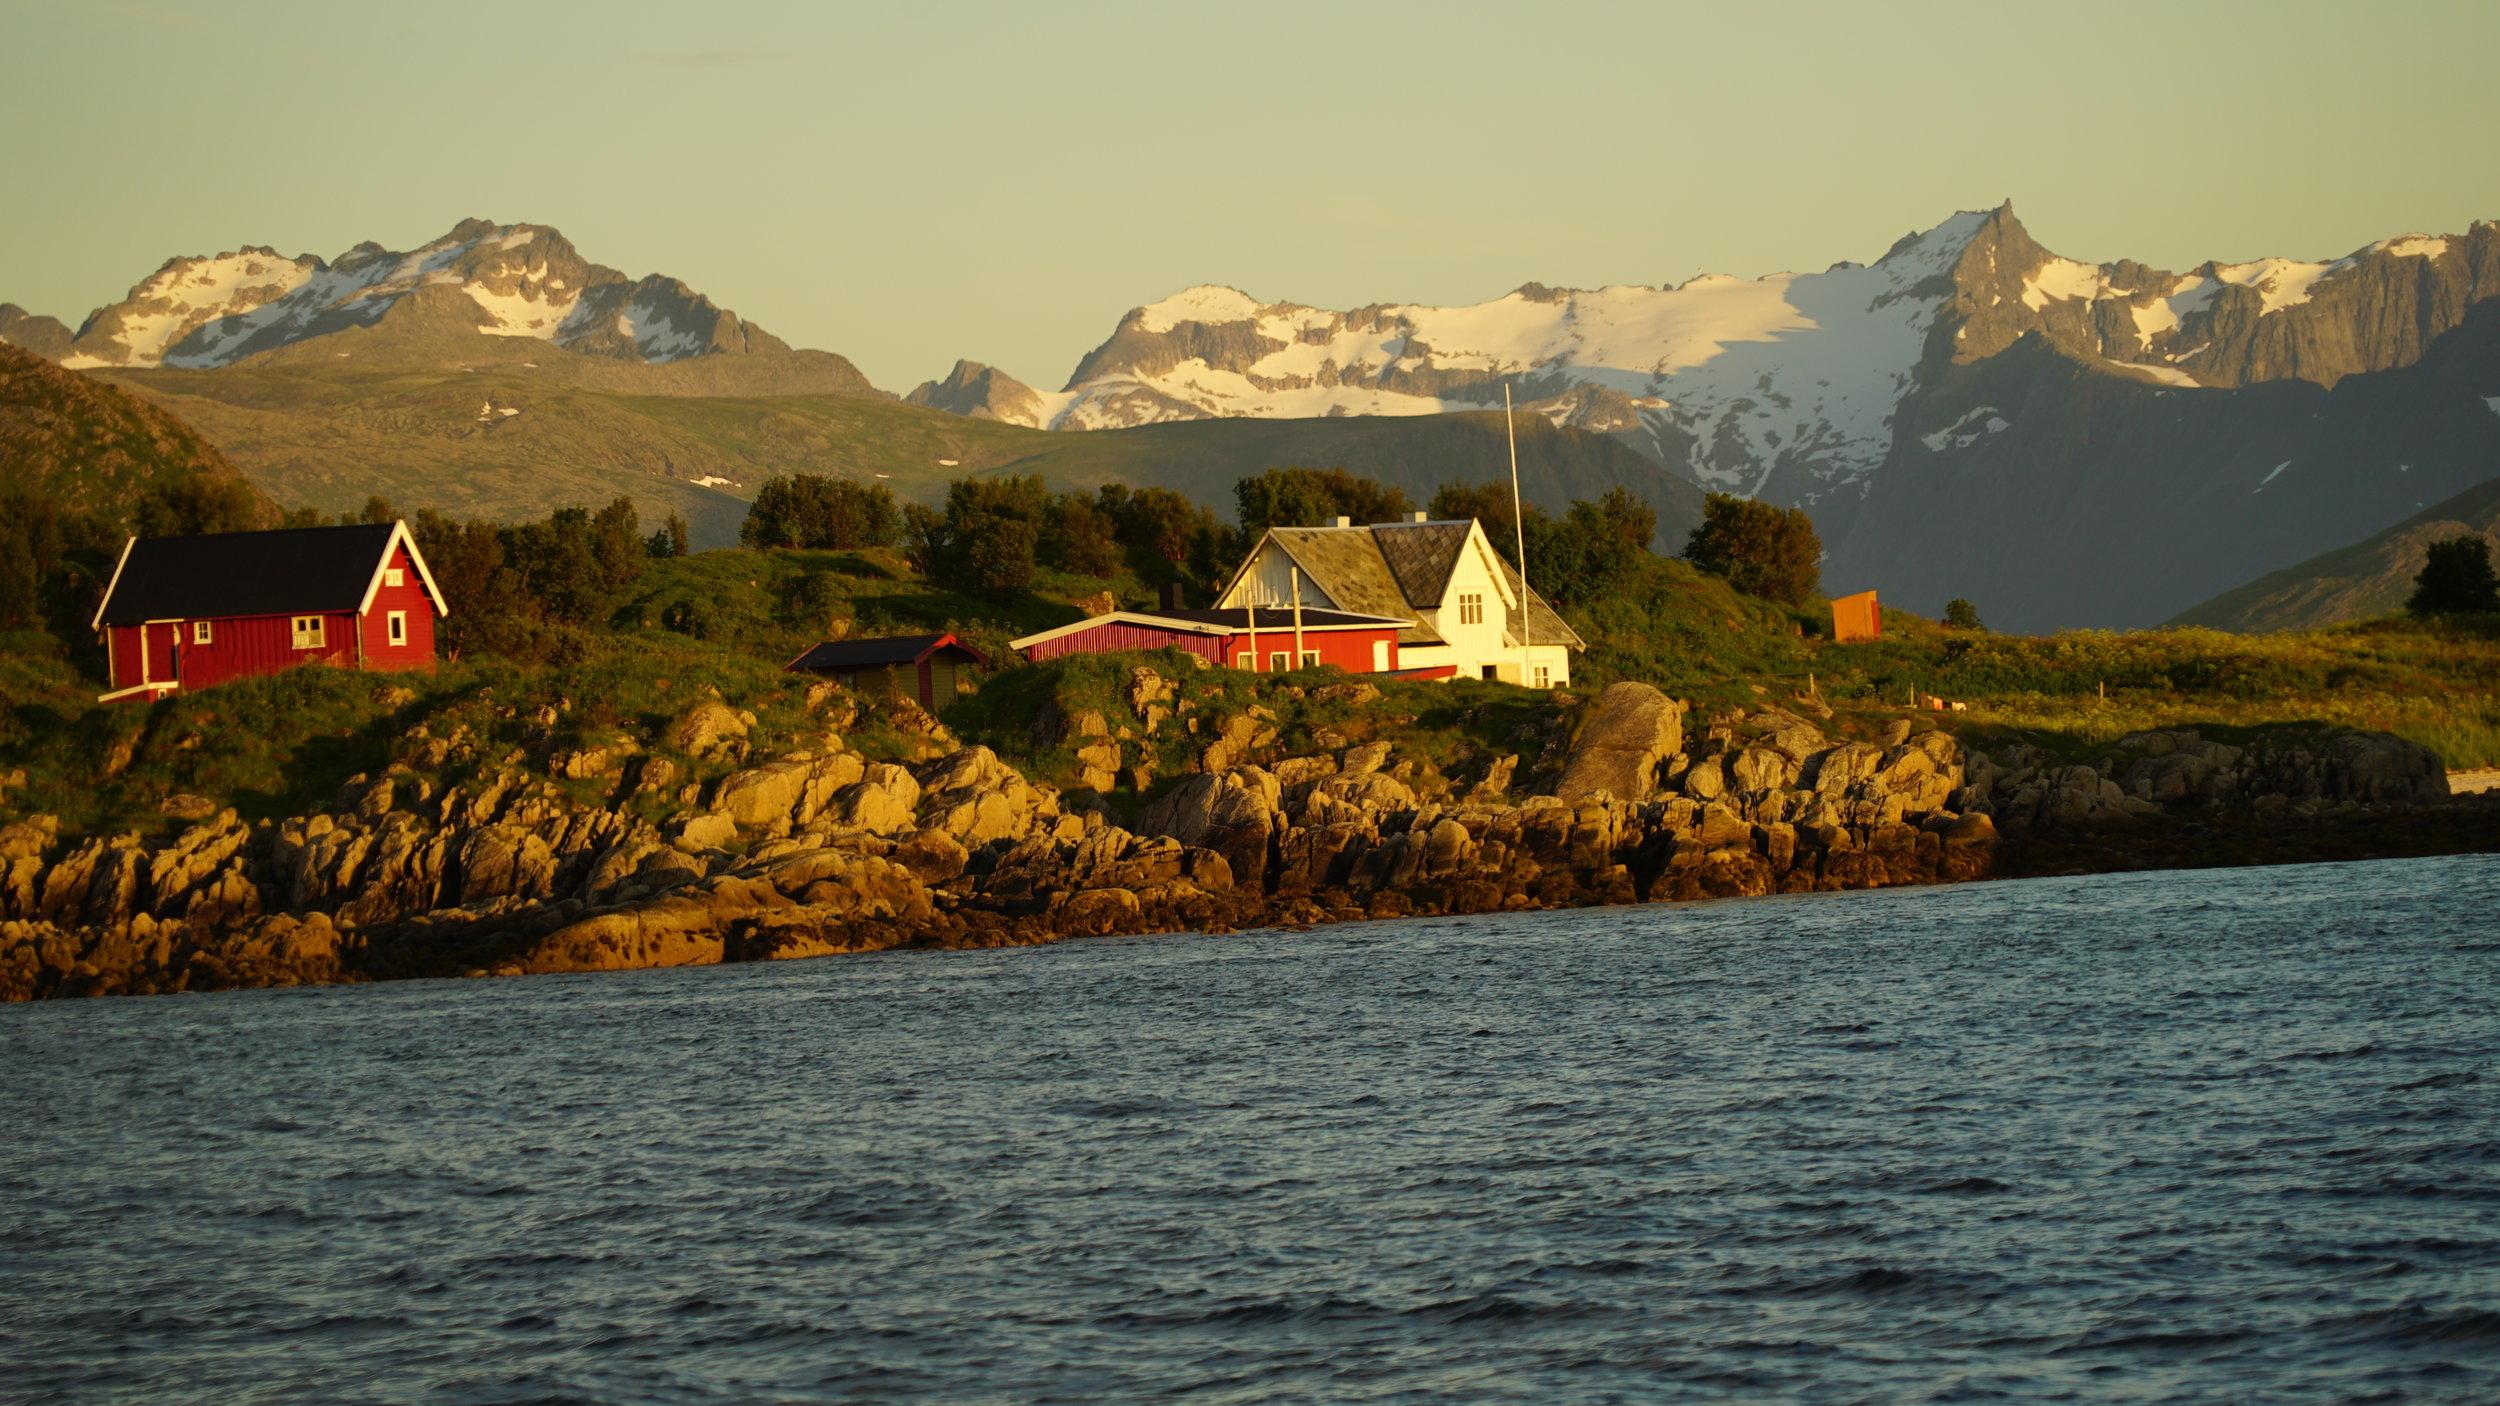 #Midnightsun #Boat #Cruise #Tromso